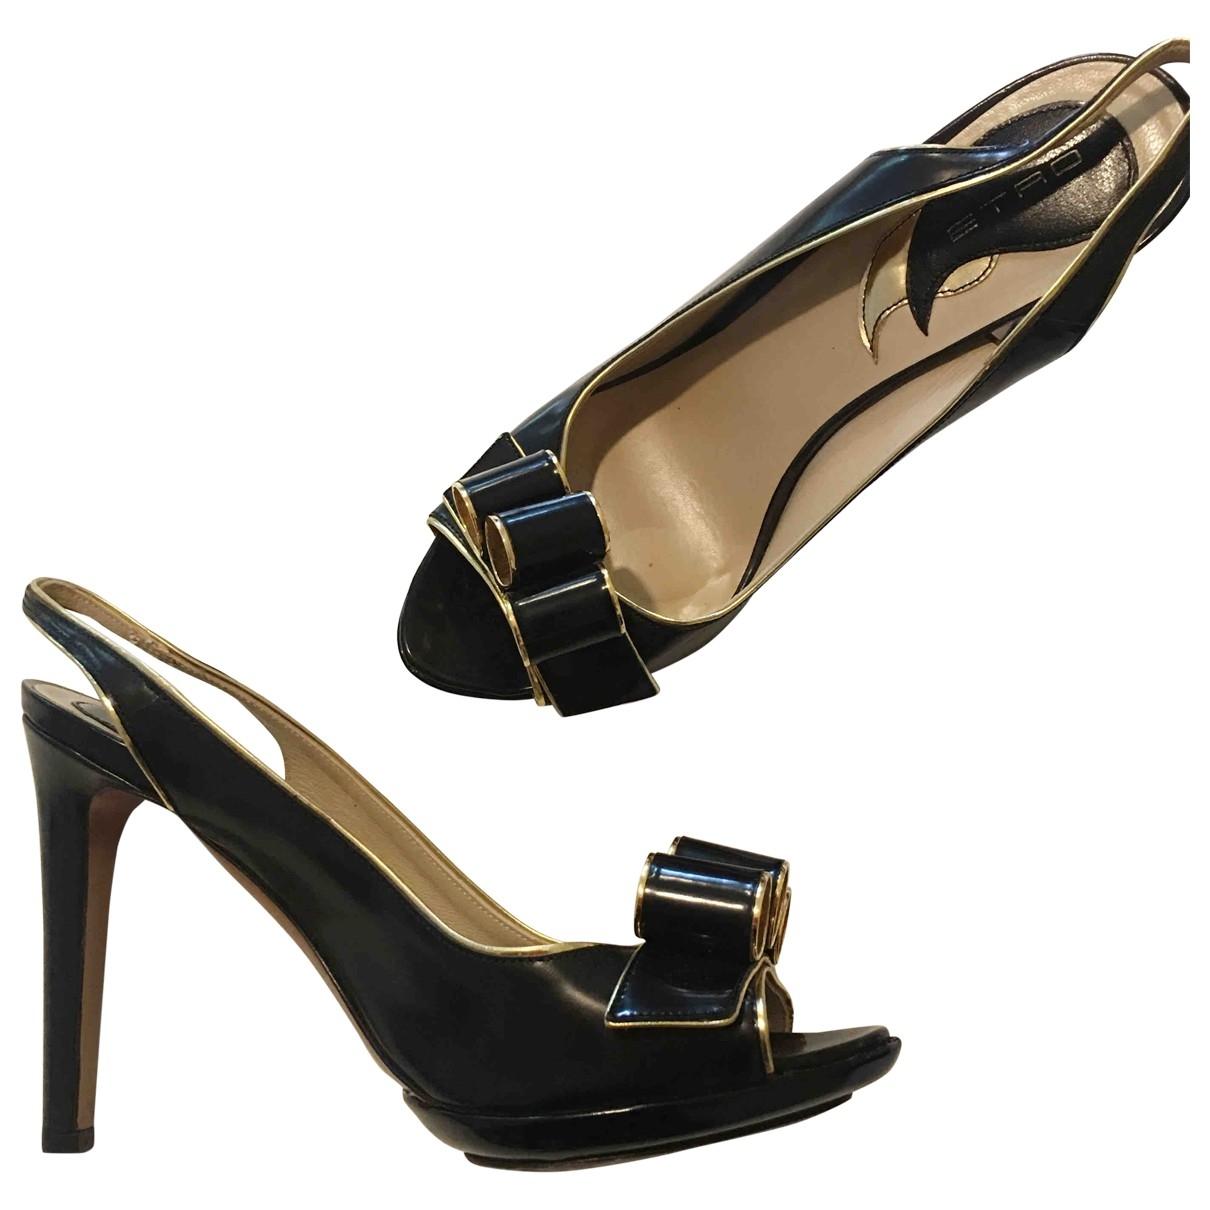 Etro \N Black Leather Sandals for Women 37.5 EU